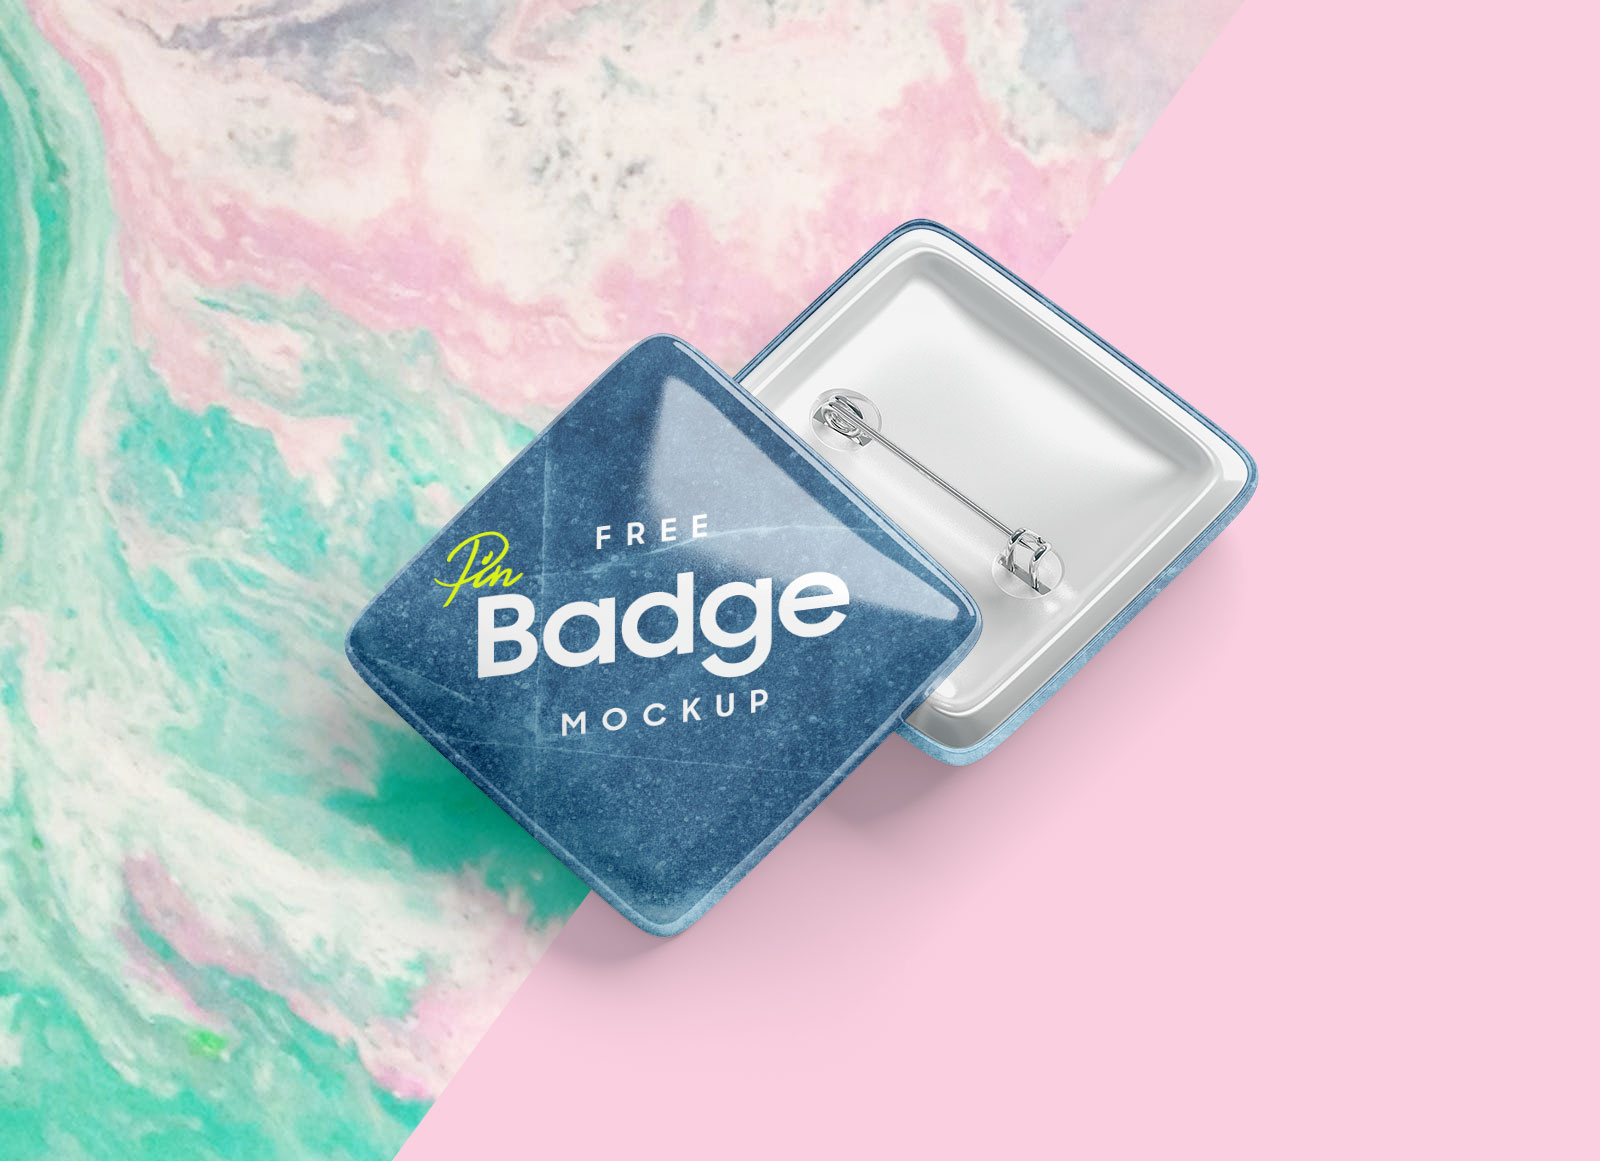 Free-Square-Pin-Button-Badge-Mockup-PSD